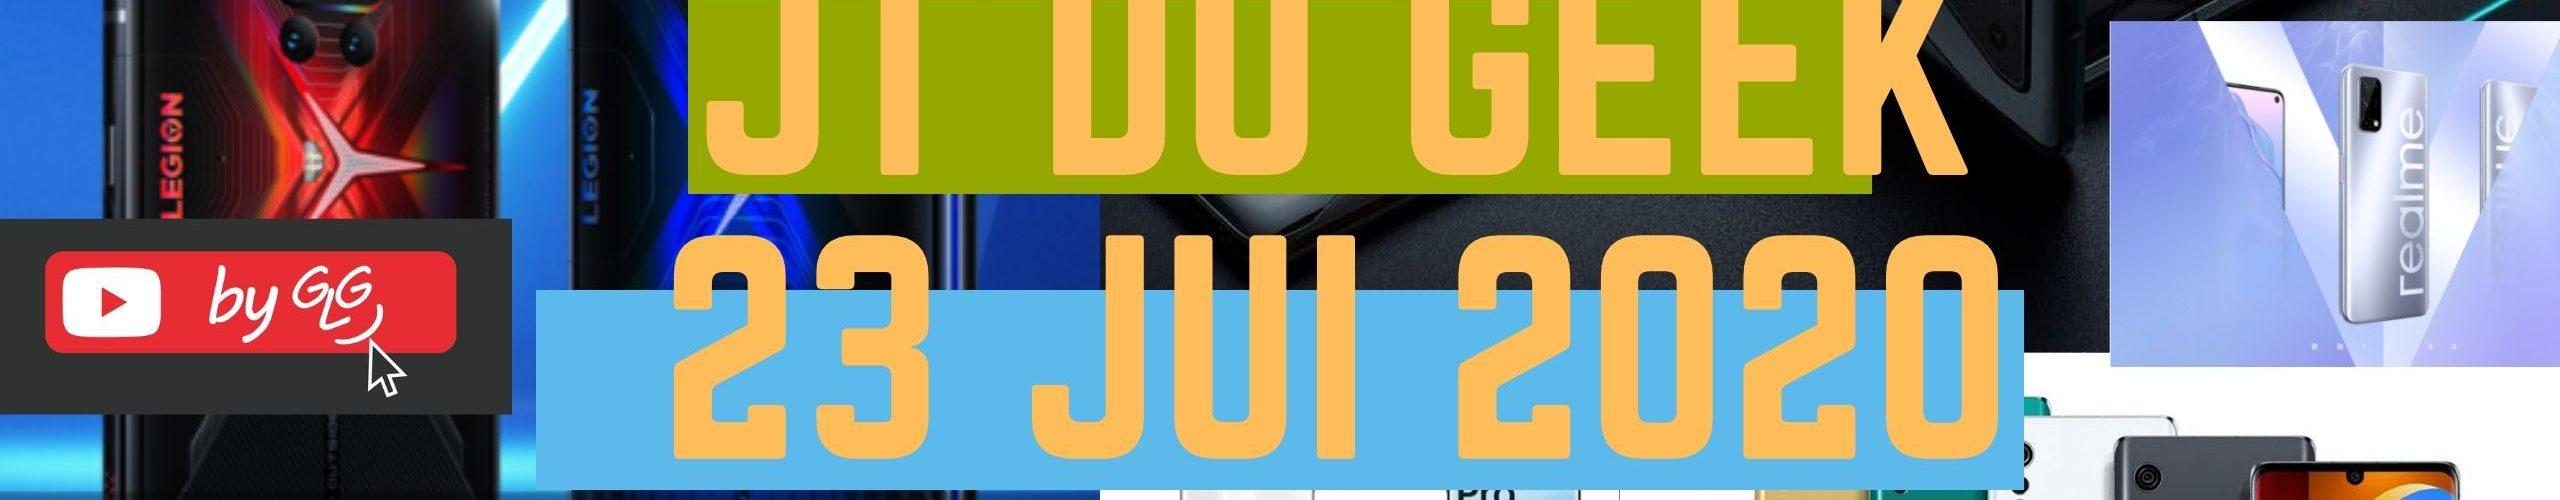 Zap Actu Tech 23 Juillet By Glg